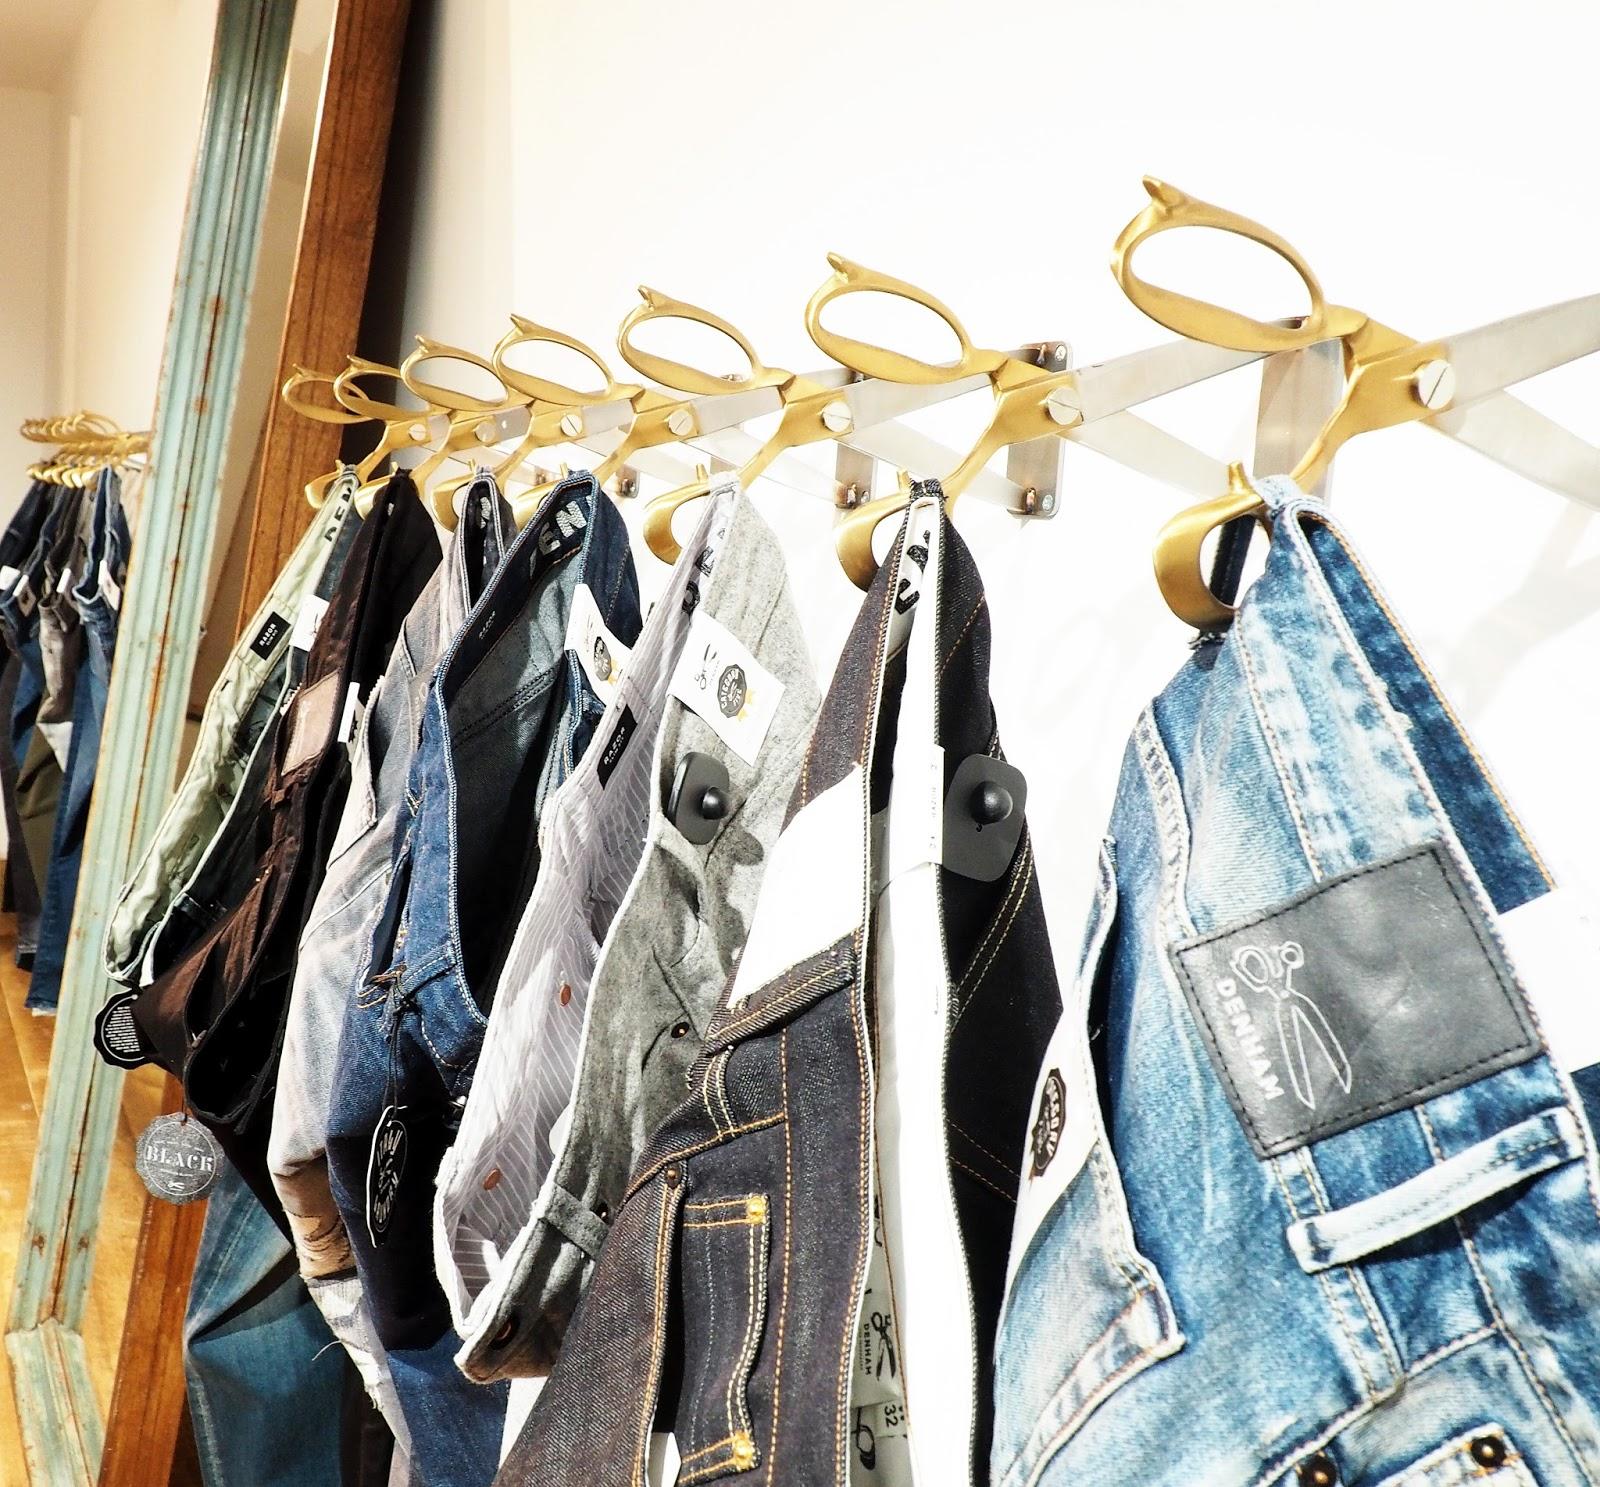 Denham Denim Jeans Leeds